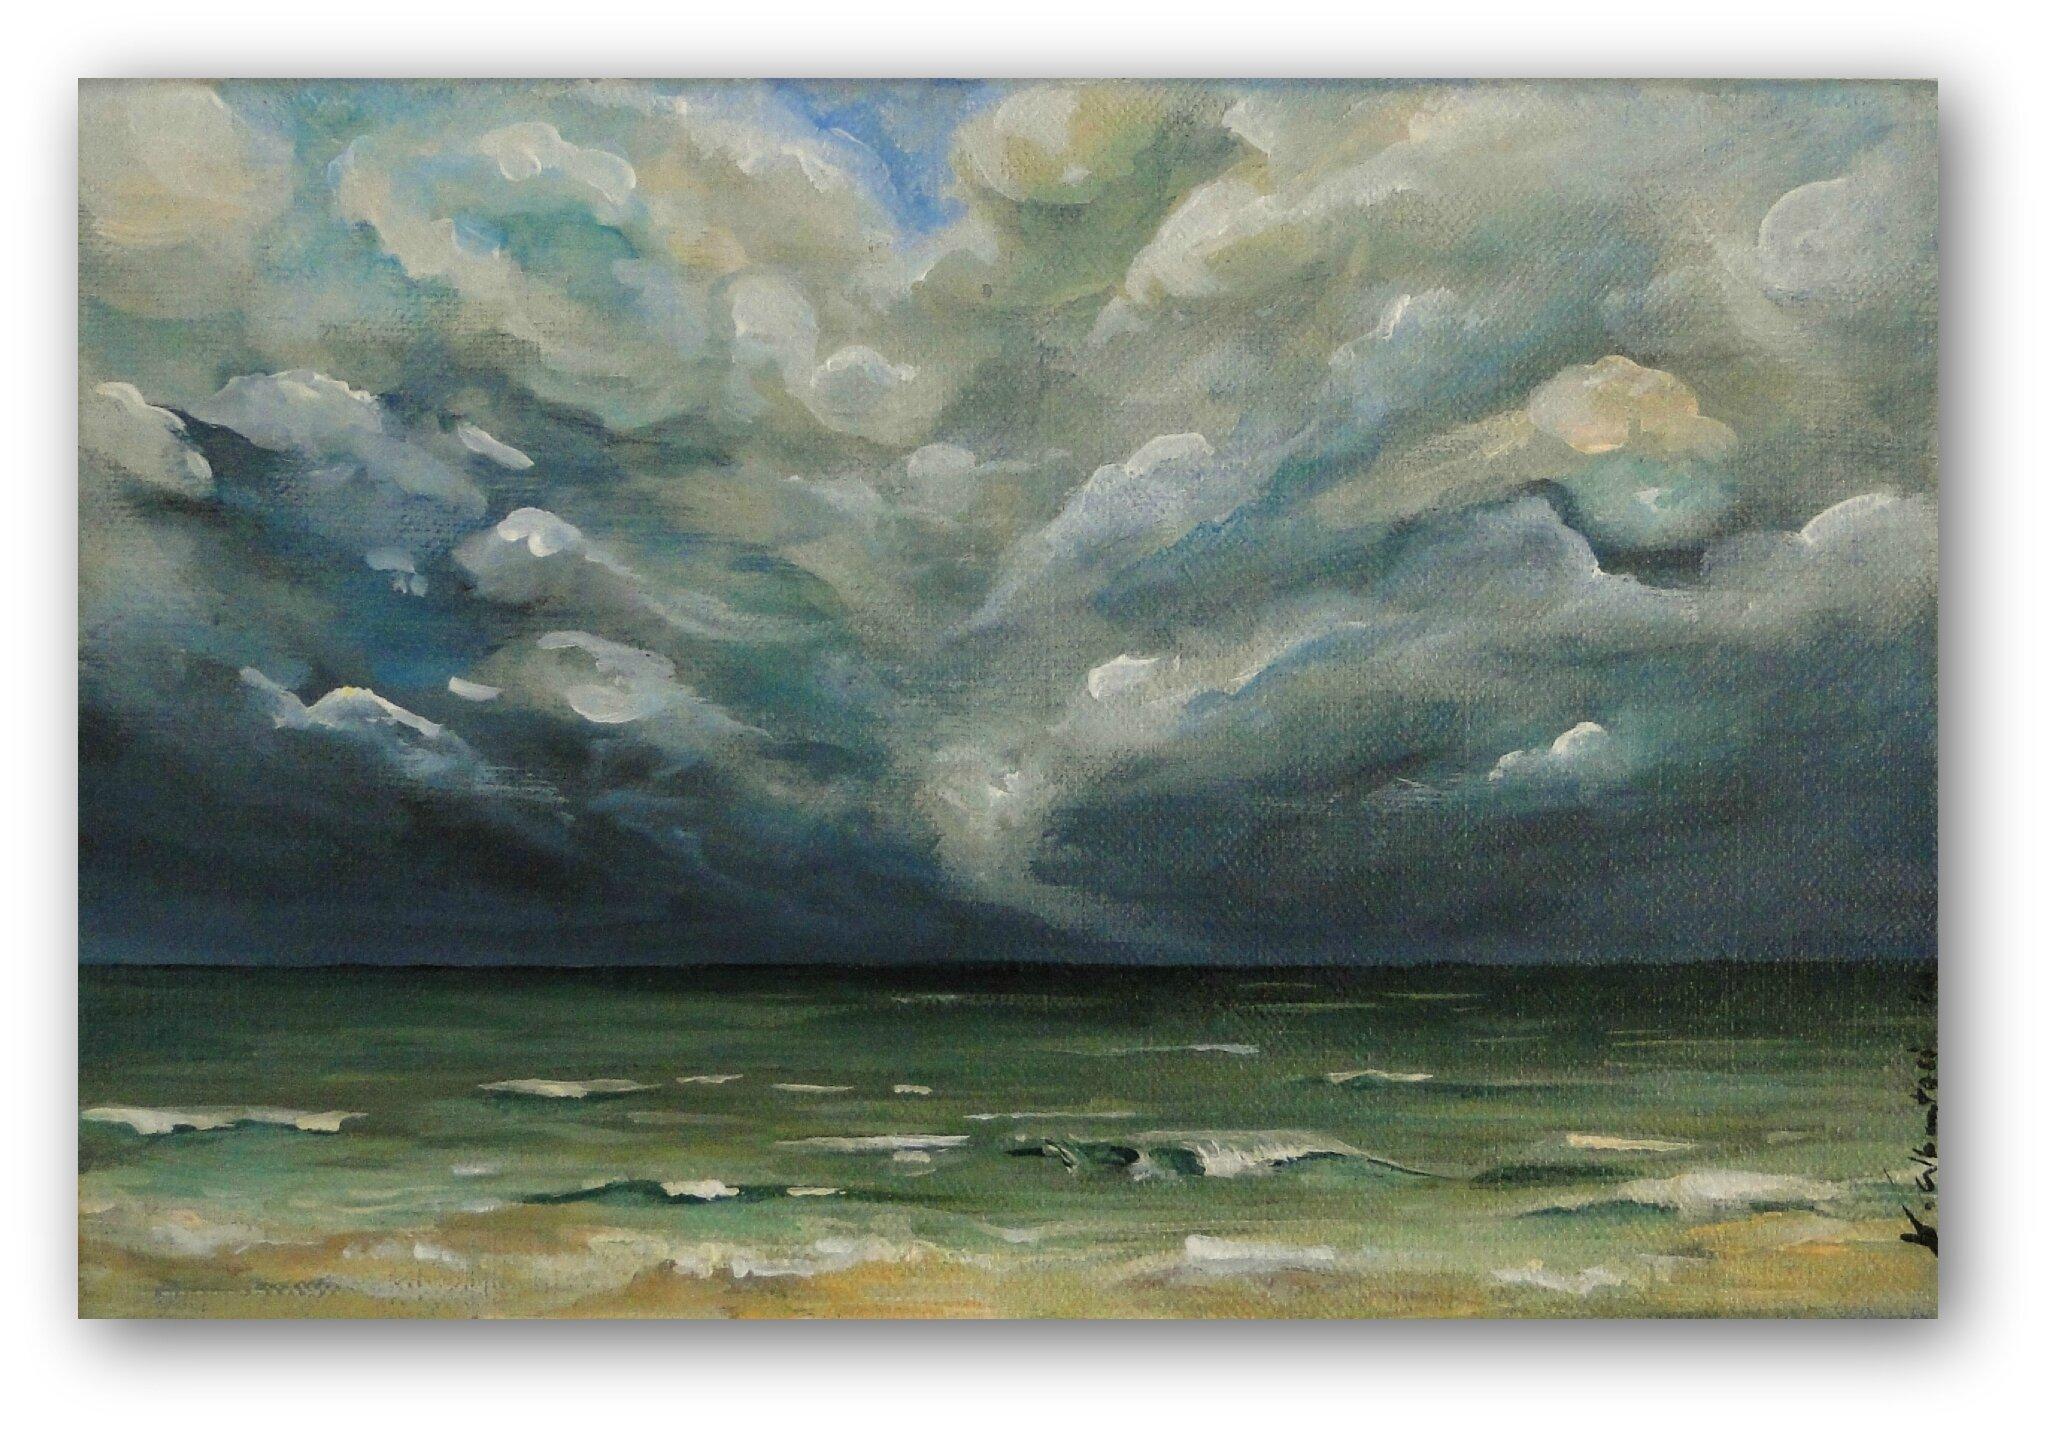 tableau peinture mer ocean orage nuages plage valérie albertosi